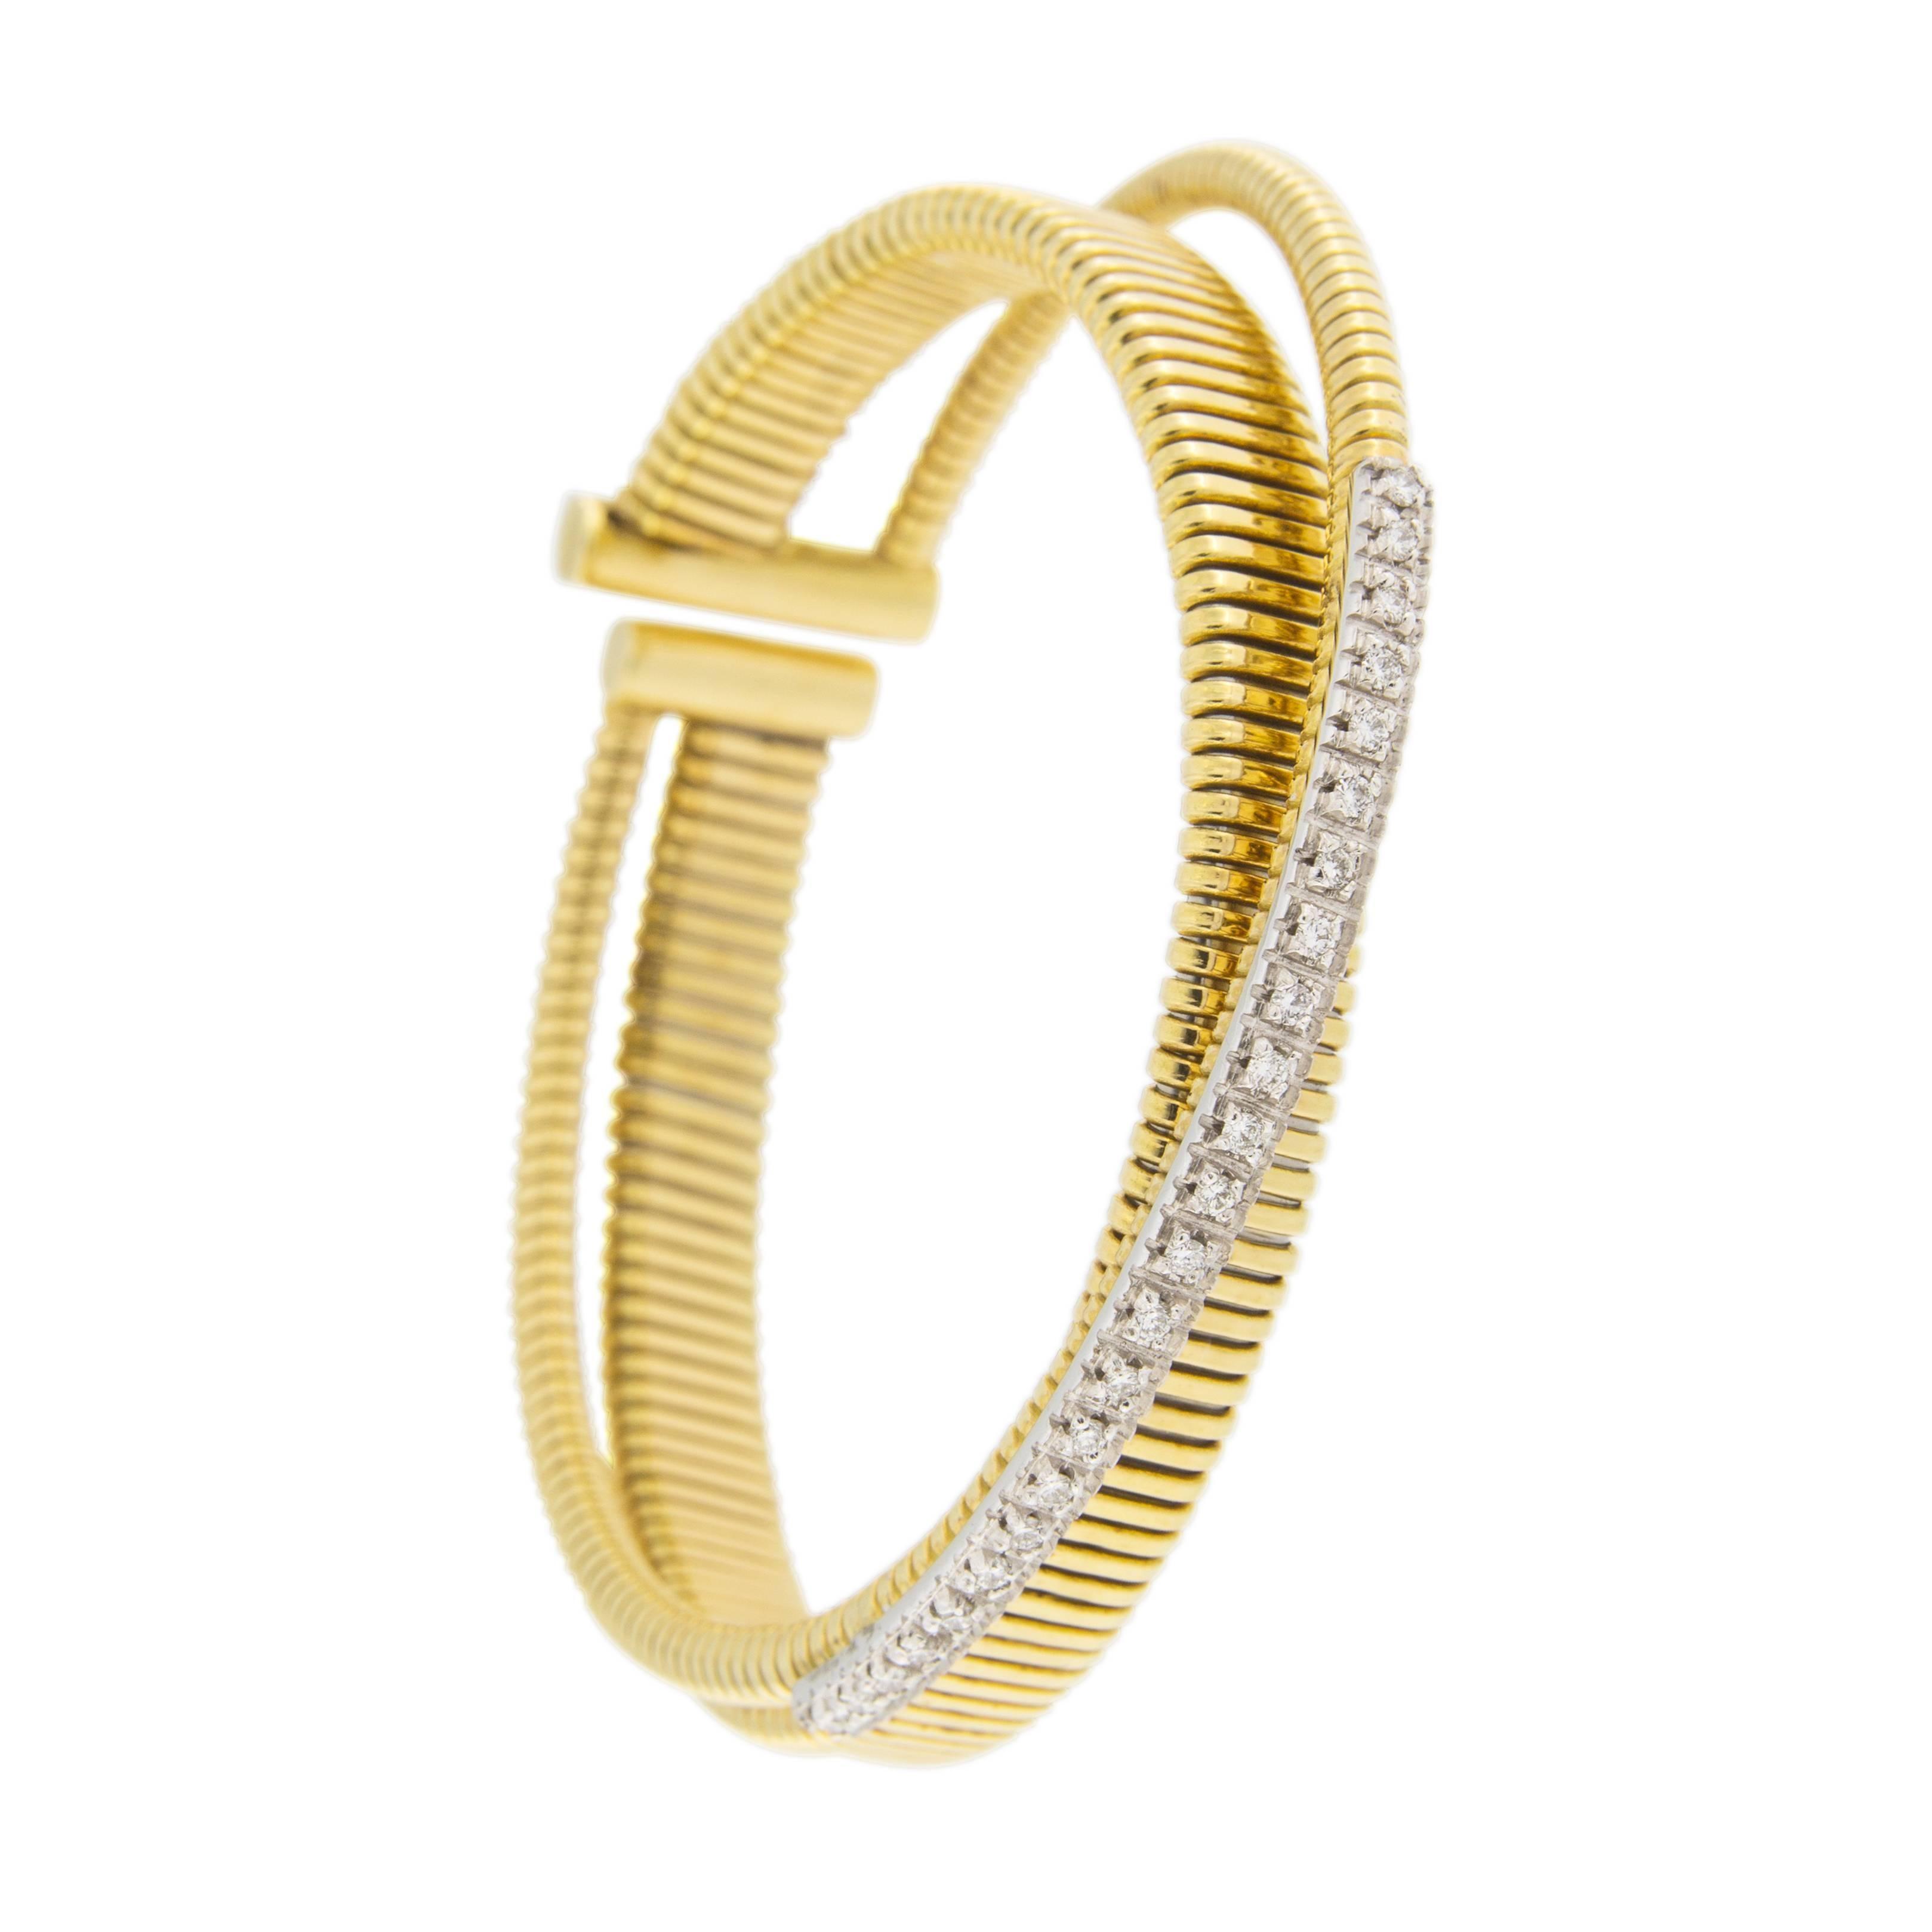 Alex Jona White Diamond 18 Karat Yellow Gold Tubogas Bangle Bracelet